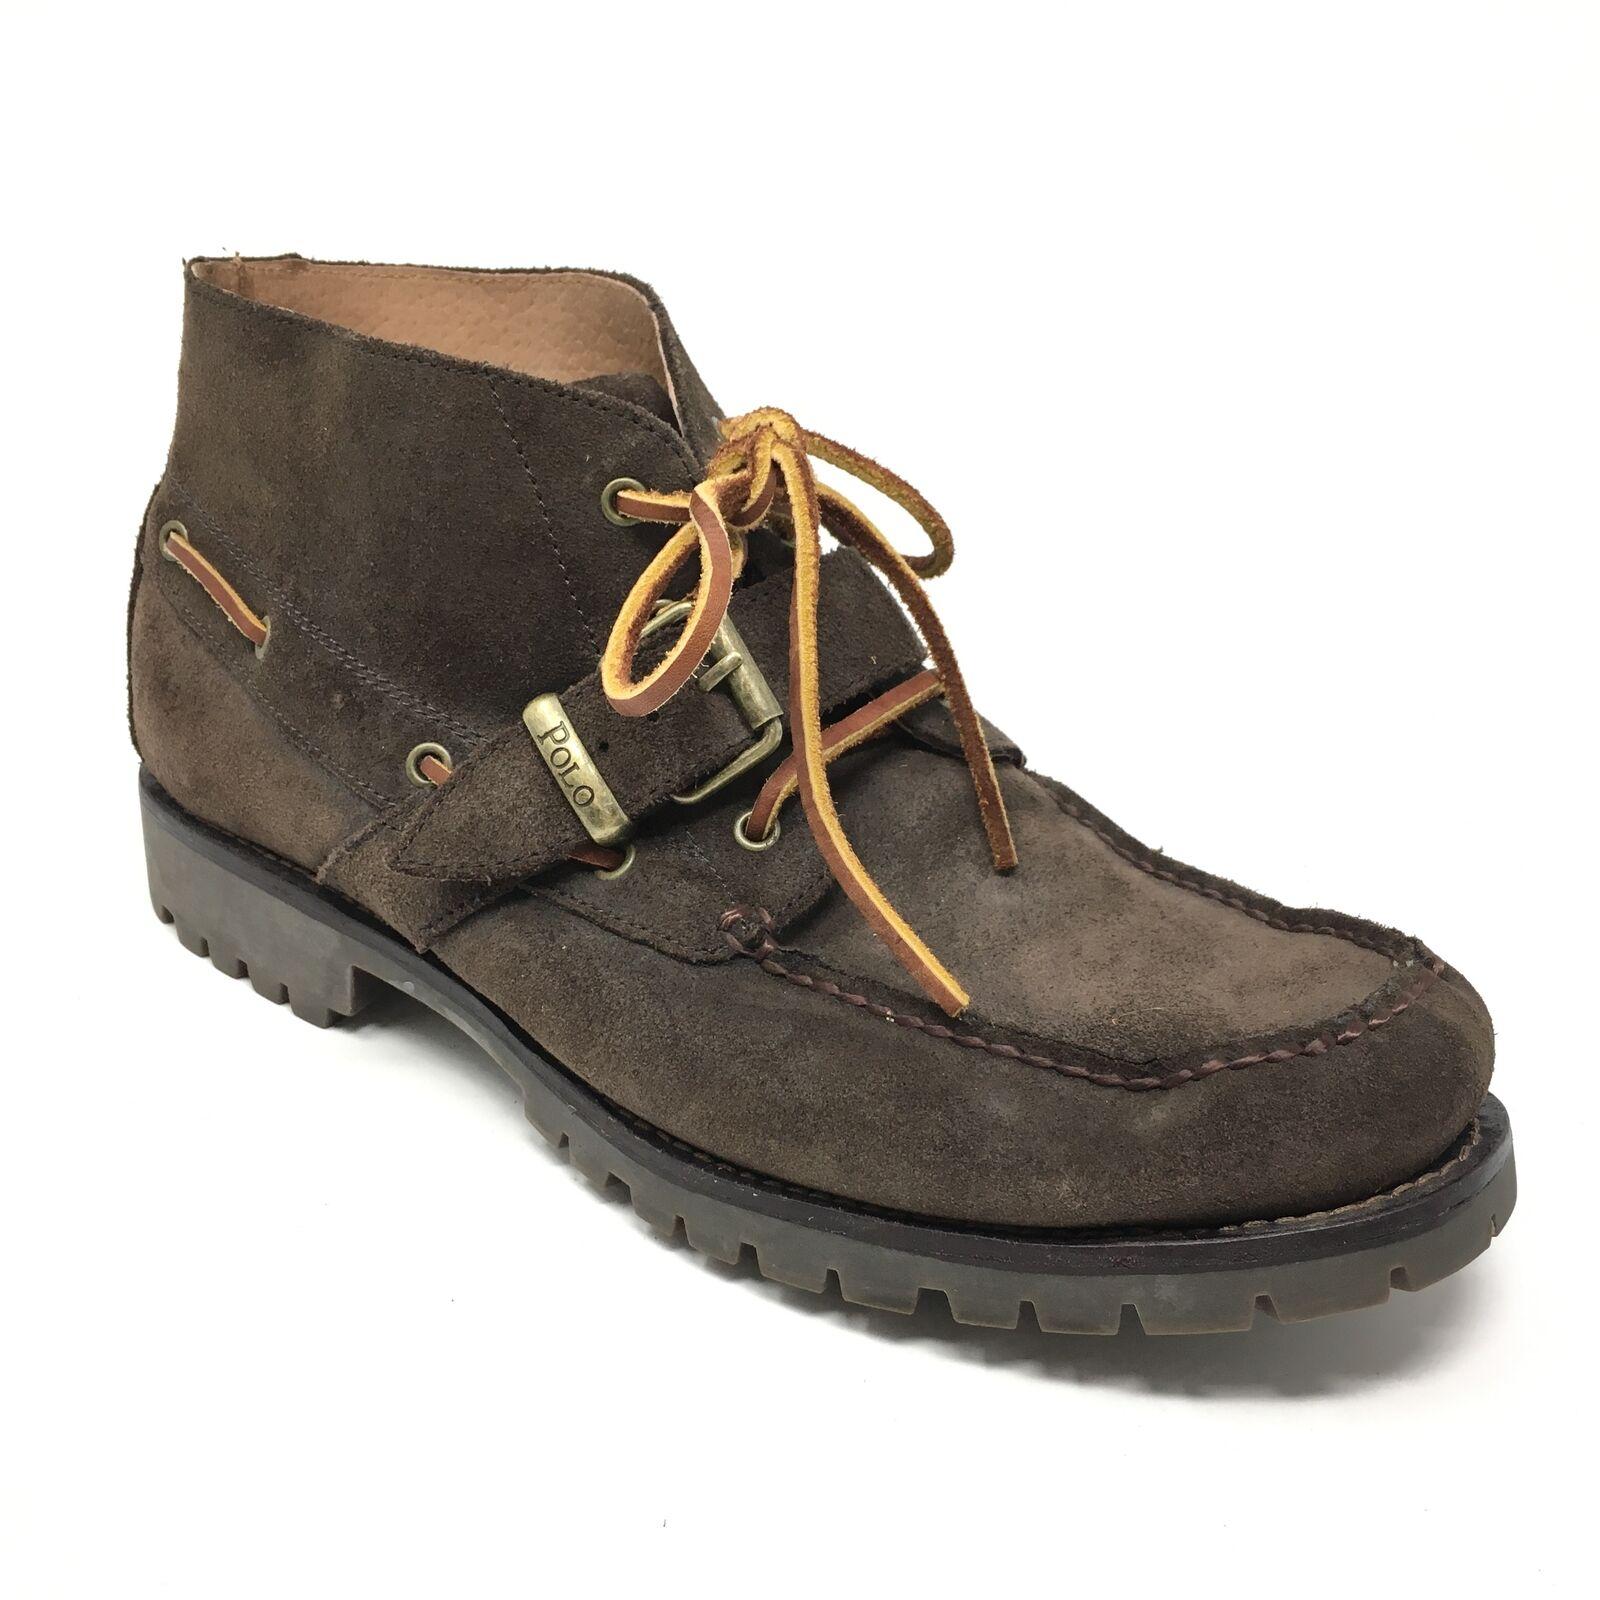 Para hombres Polo Ralph Lauren Zapatos botas al Tobillo Rumford tamaño 11D C1 Hebilla De Gamuza Marrón